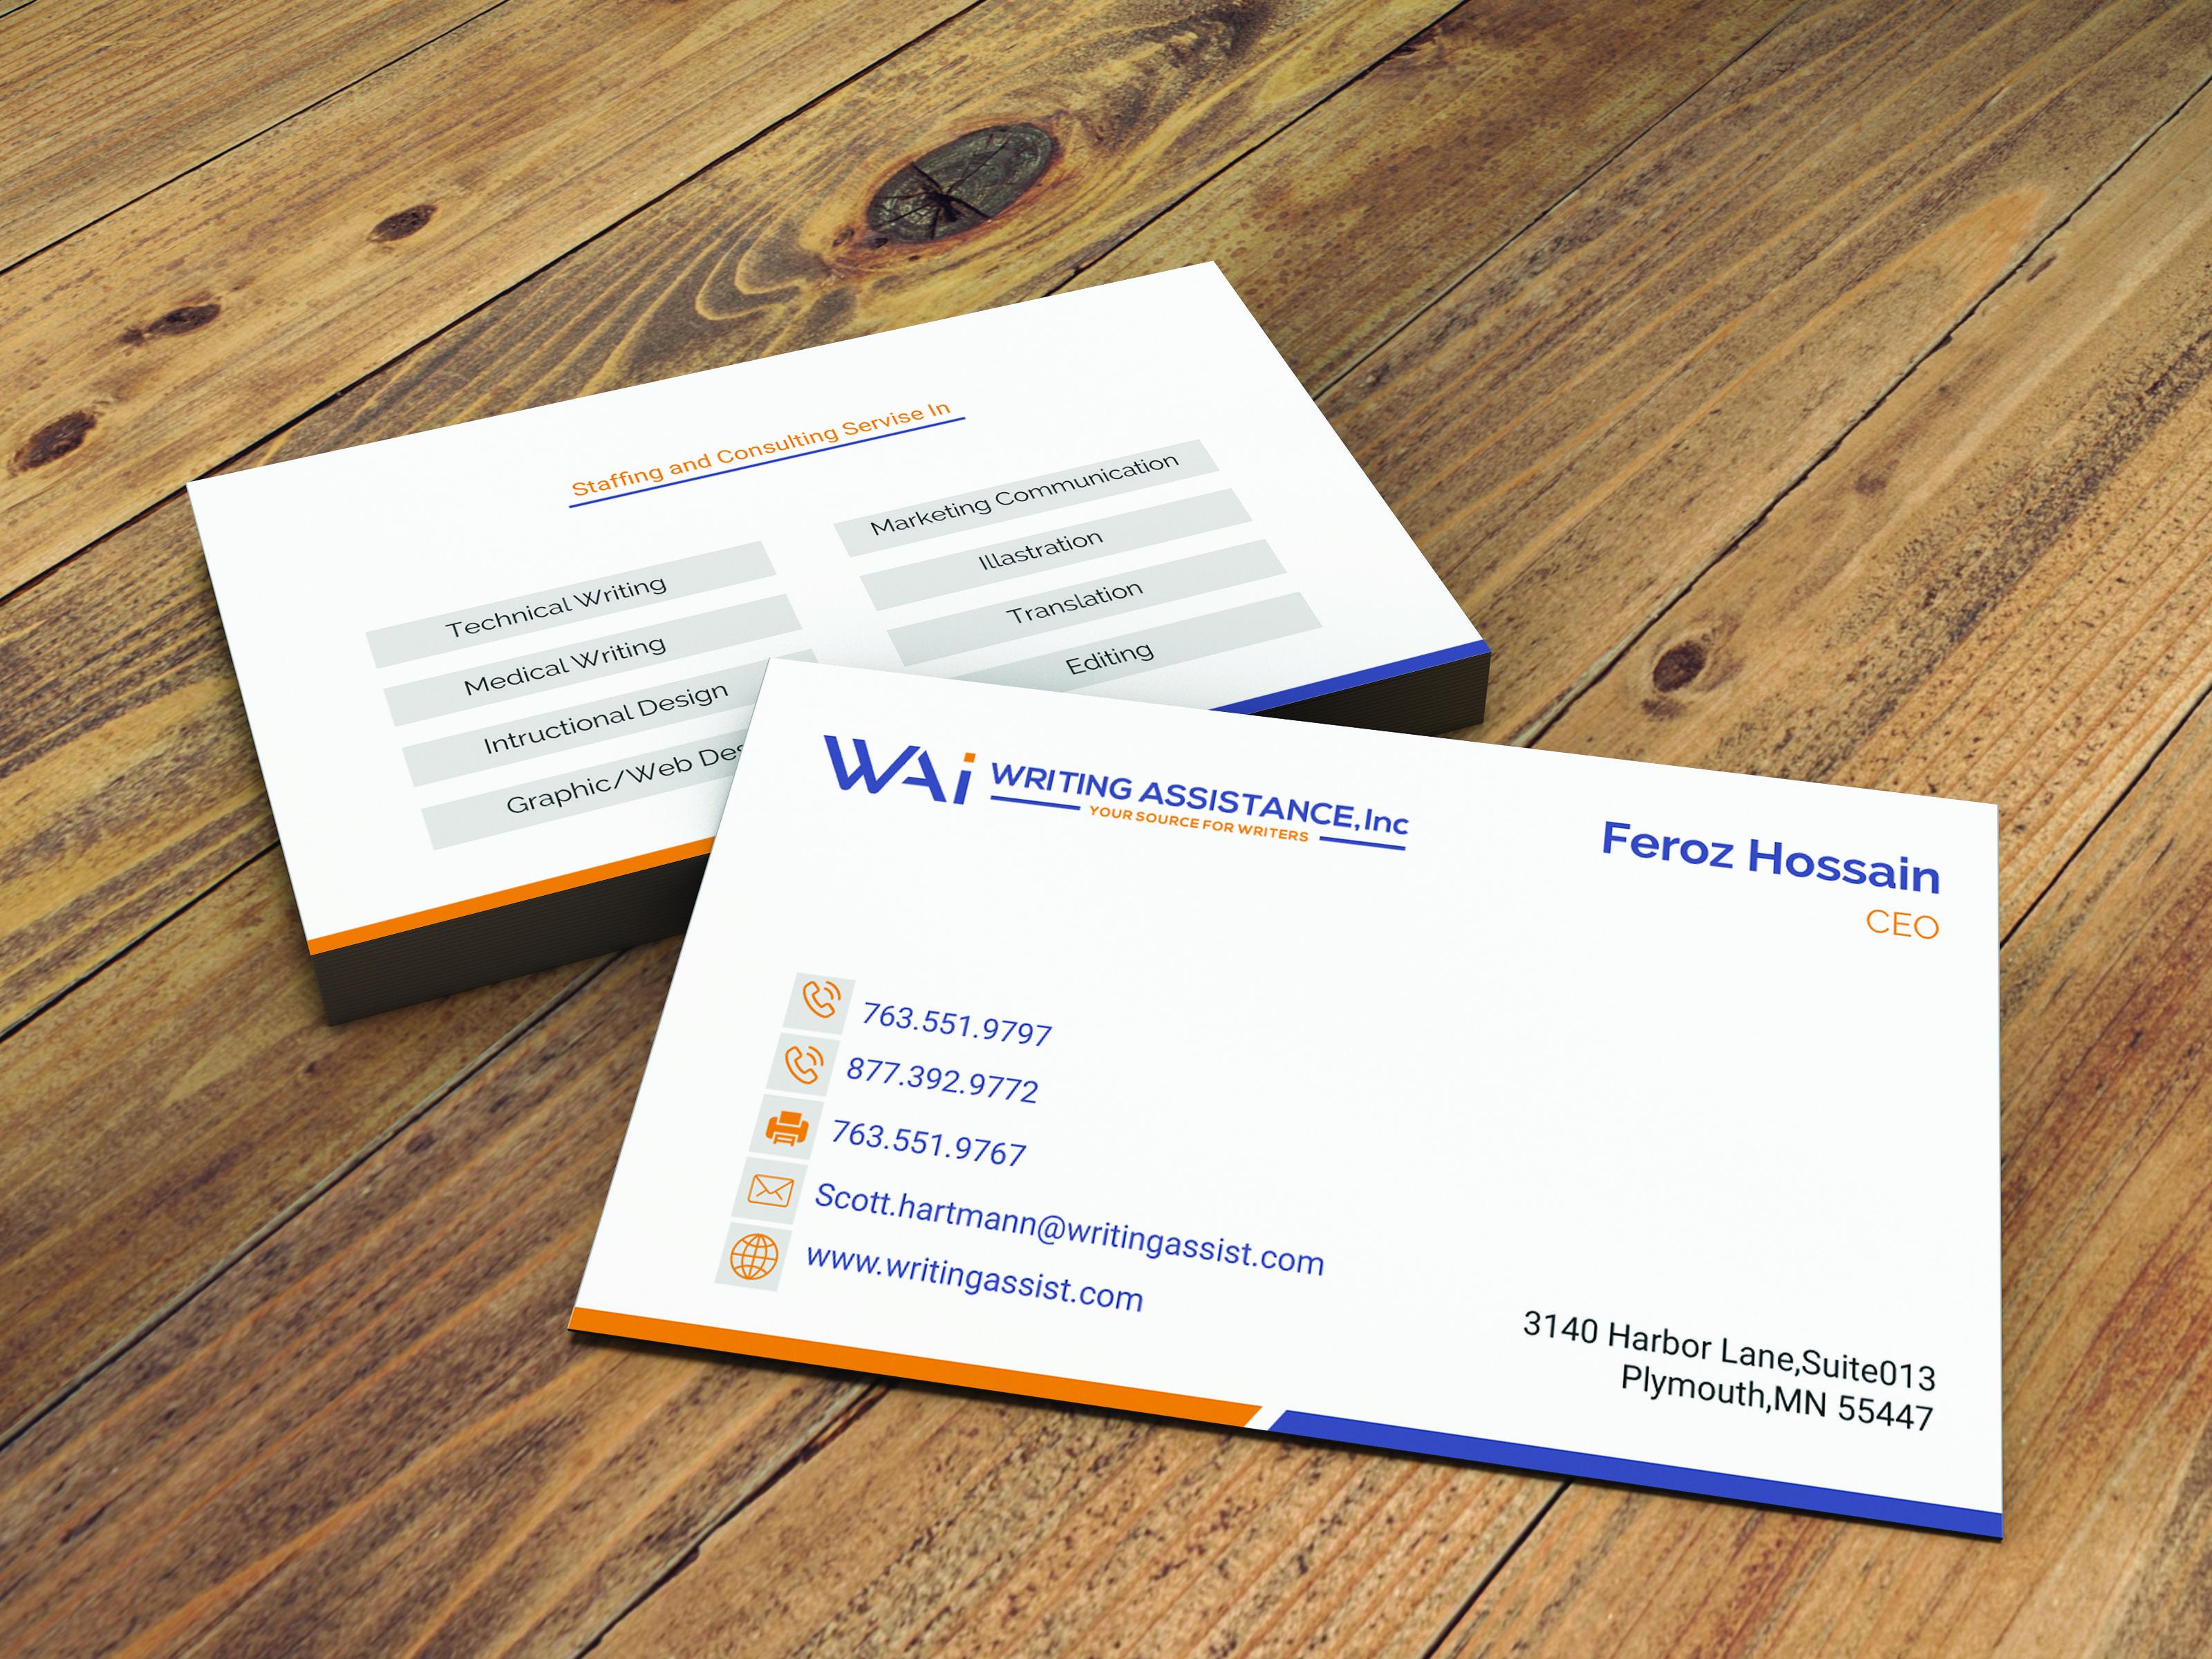 Simple Business Card Design By Ferozhossain145130 110009 Designhill Business Card Design Simple Business Card Design Simple Business Cards